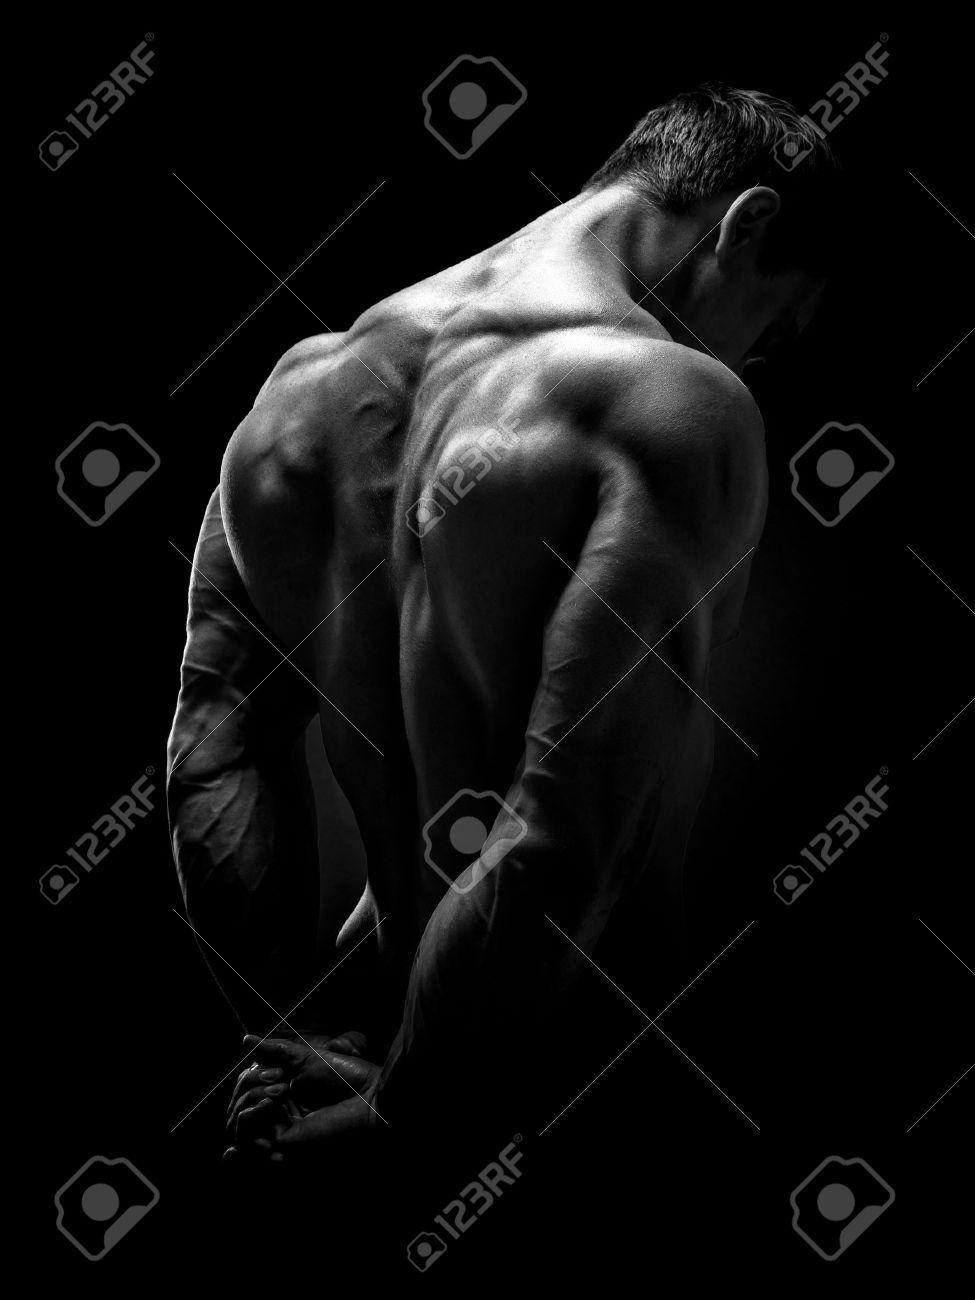 Handsome muscular male model bodybuilder preparing for fitness training turned back. Studio shot on black background. Black and white photo. Standard-Bild - 41423194